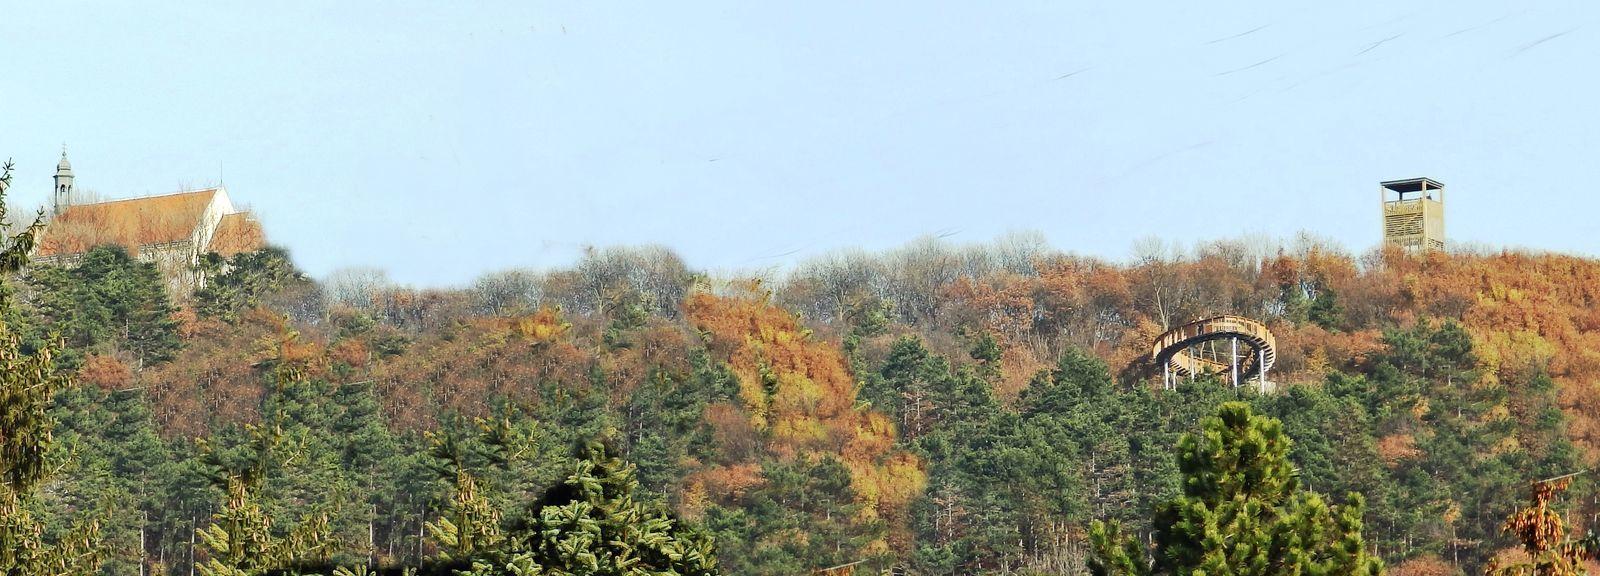 A Kisalföldi Erdőgazdaság Zrt. f45441a8db